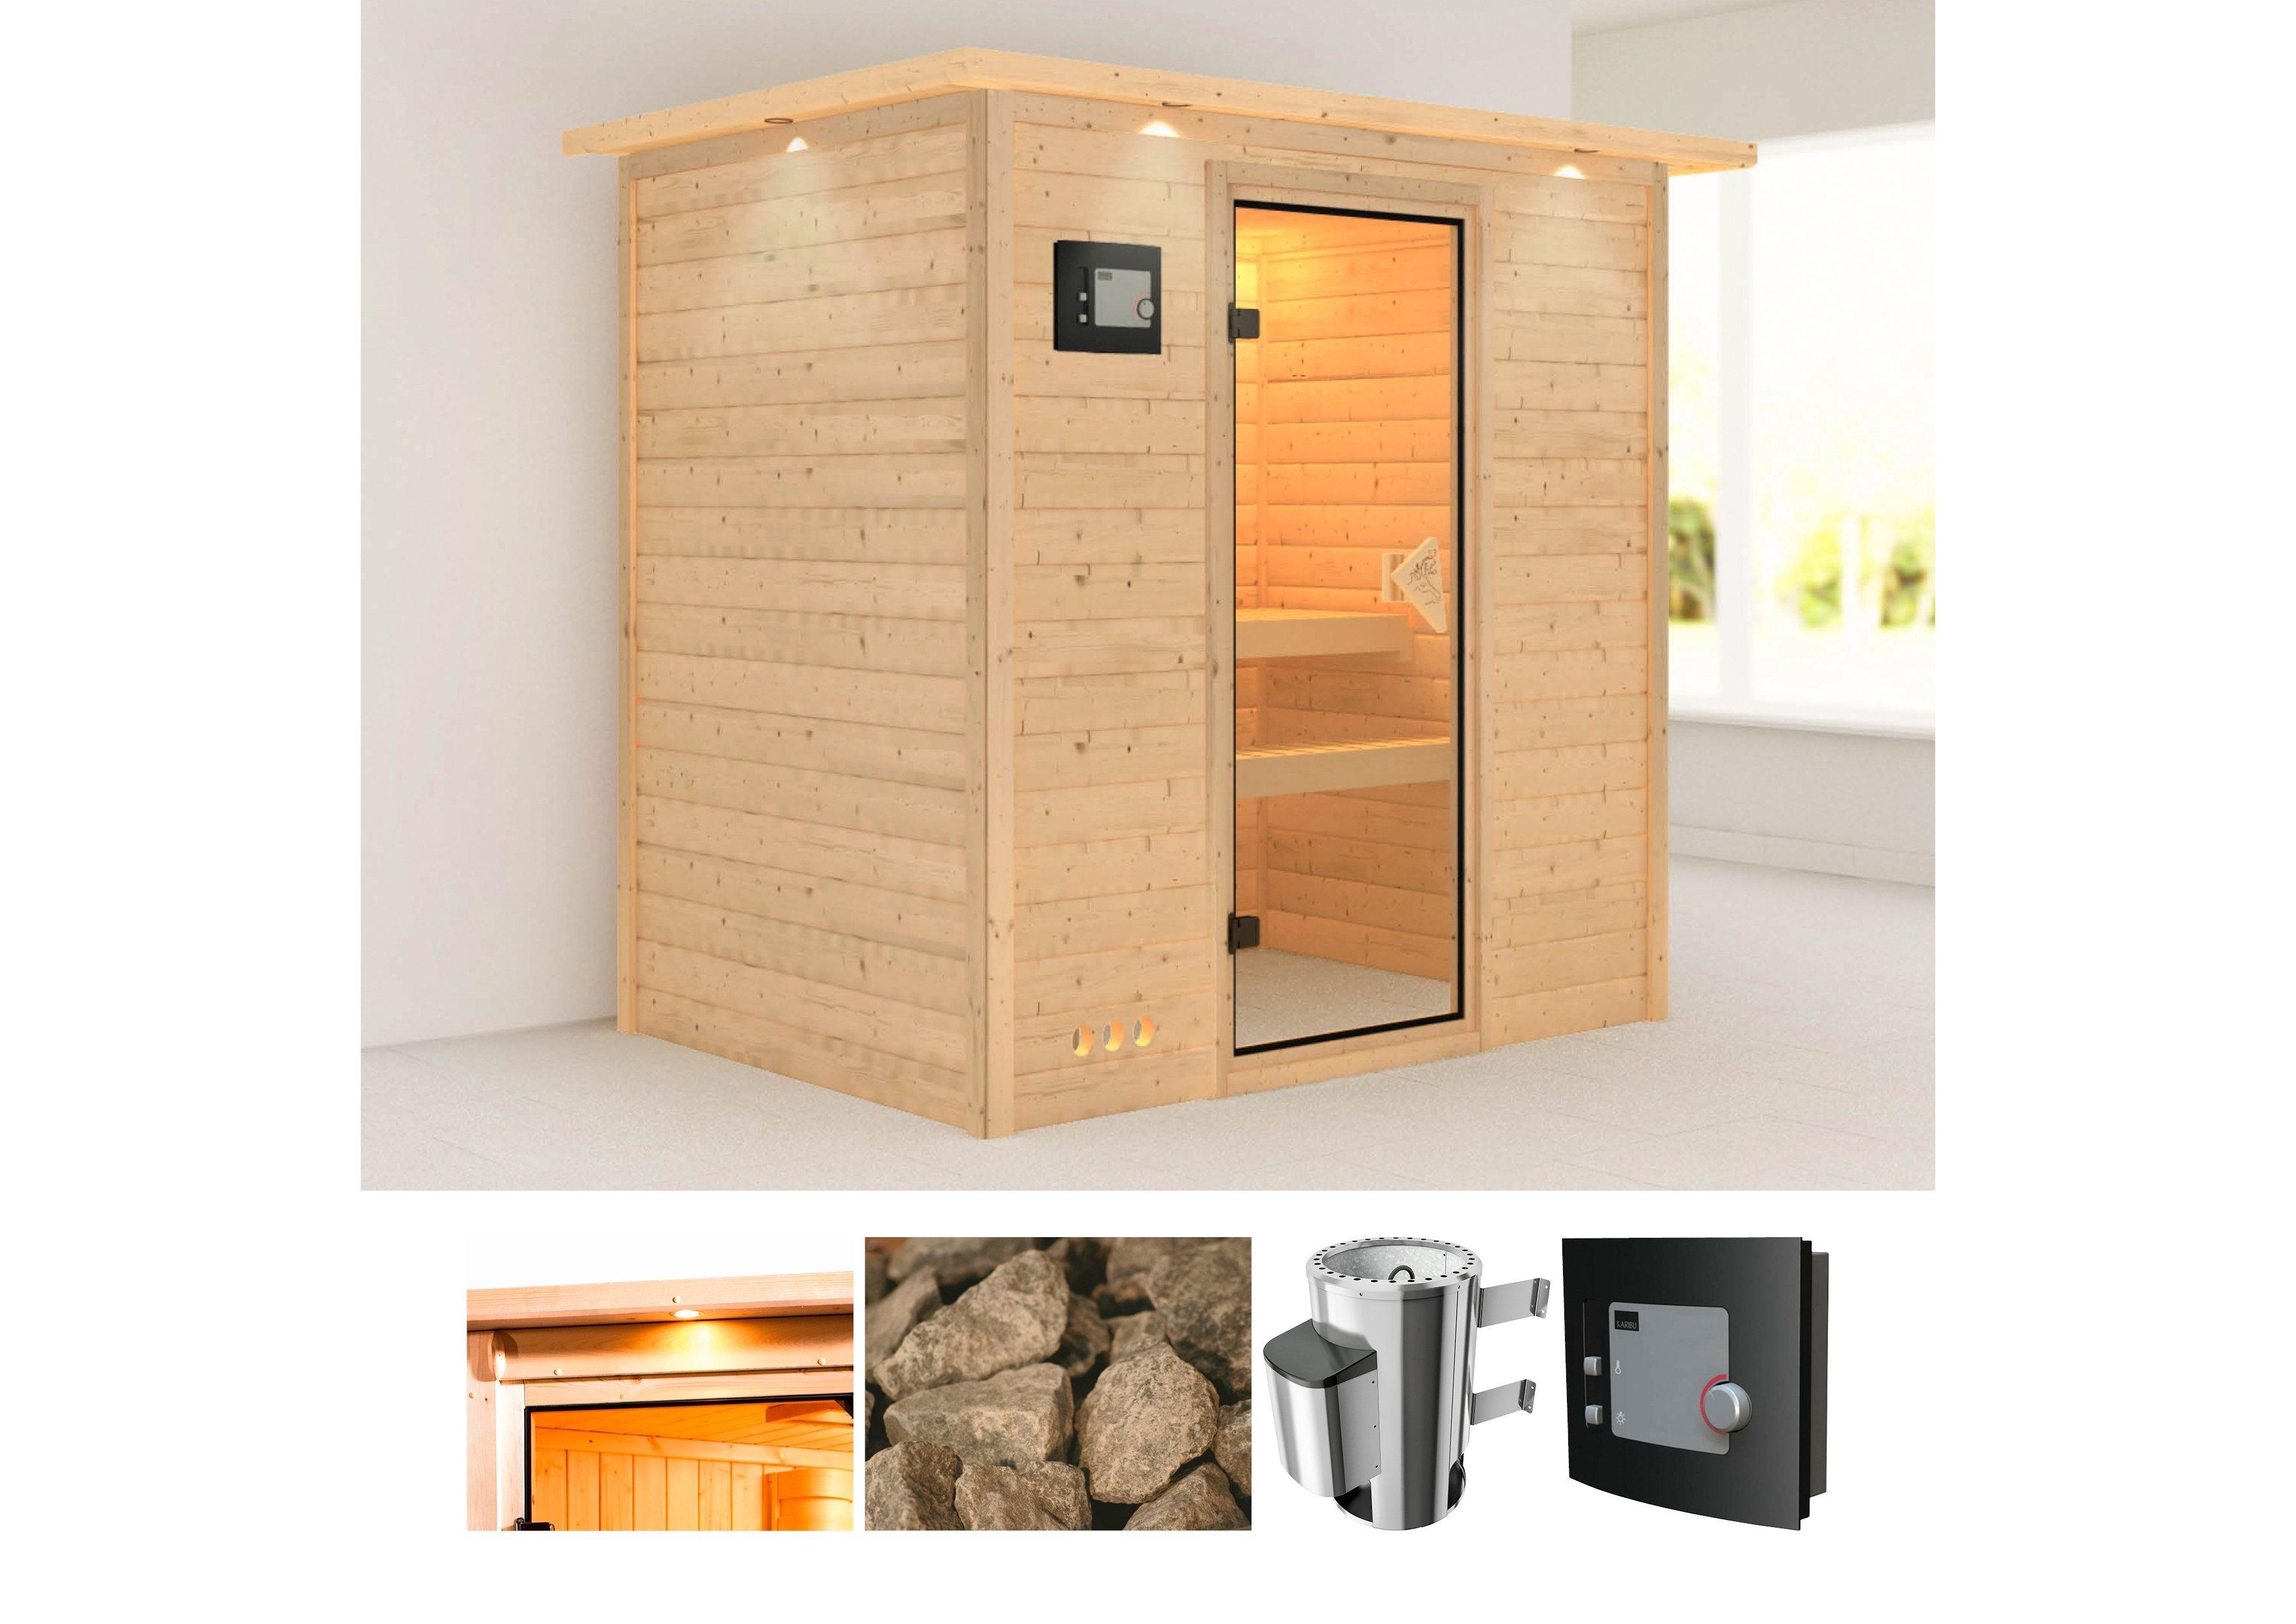 Karibu sauna »Ronja«, 224x158x202 cm, 3,6 kW Plug & Play Ofen mit ext. Steuerung - gratis ruilen op otto.nl